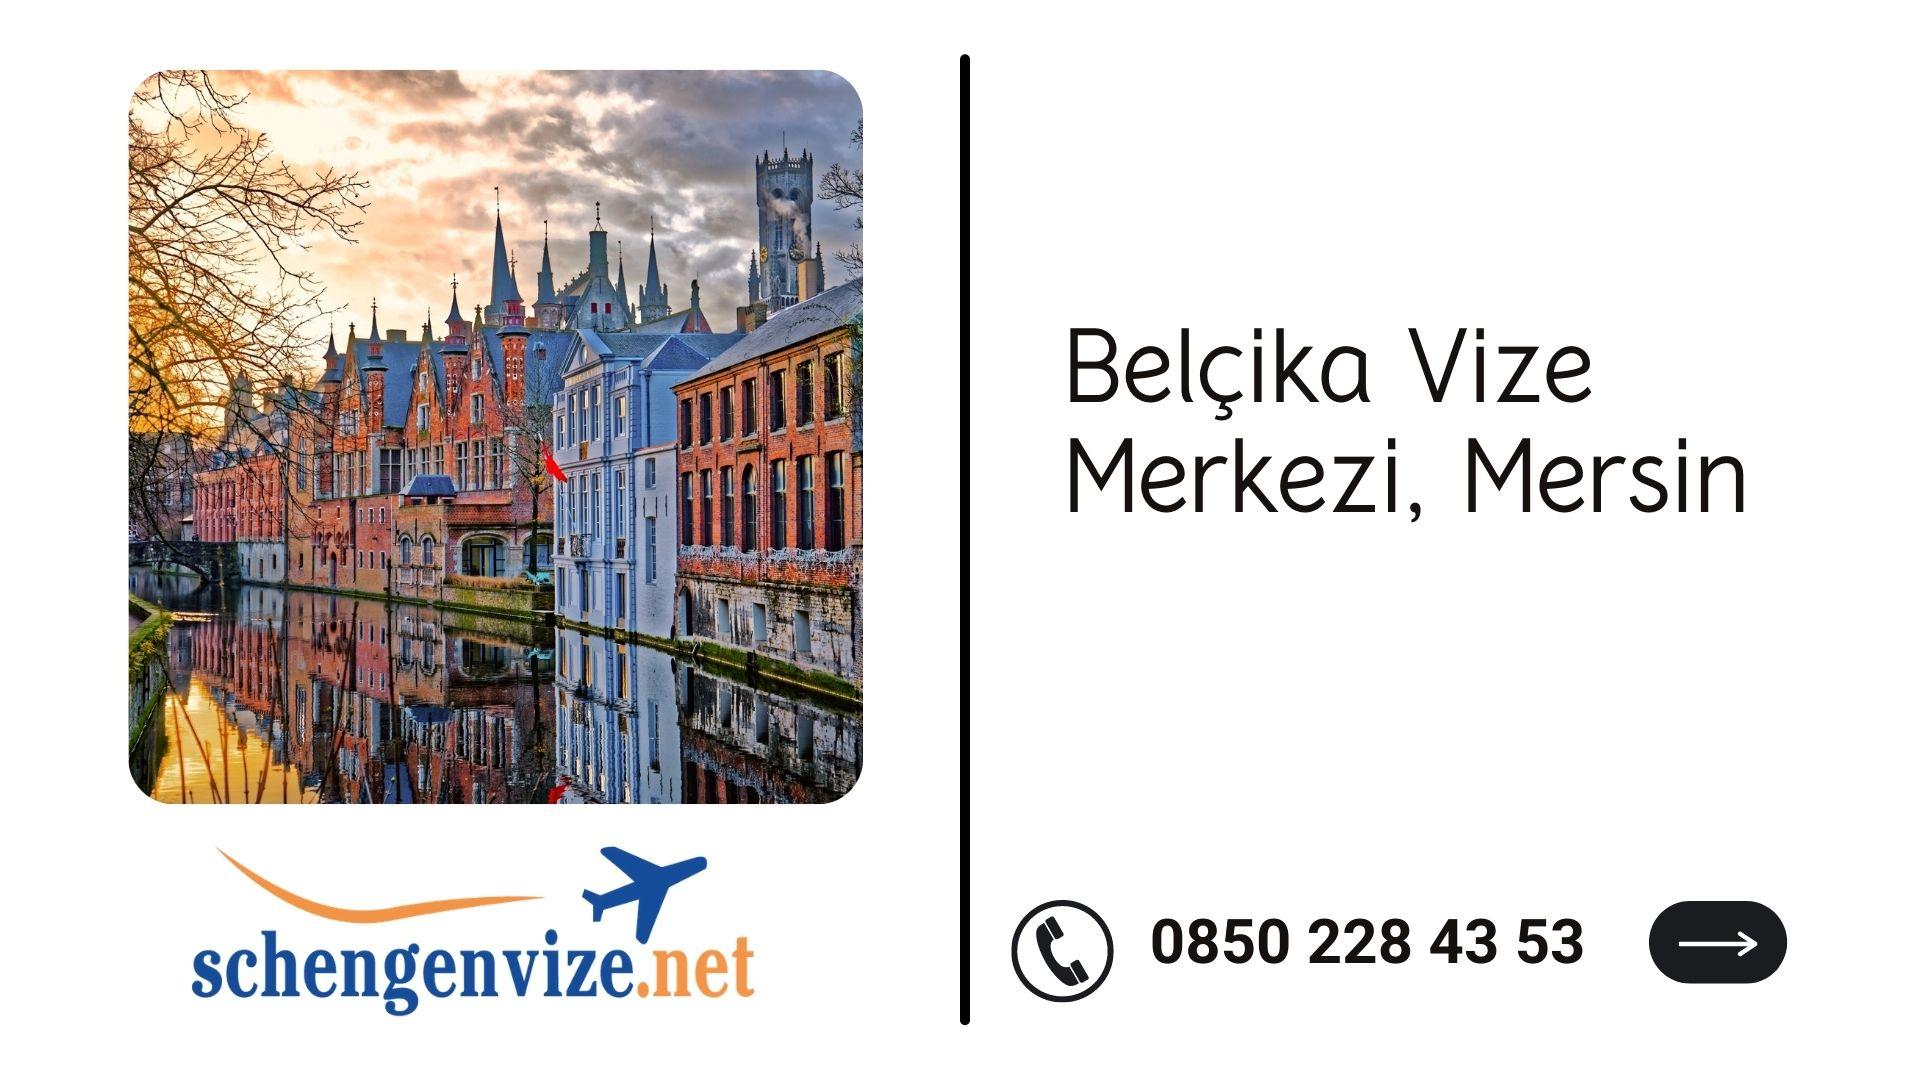 Belçika Vize Merkezi, Mersin